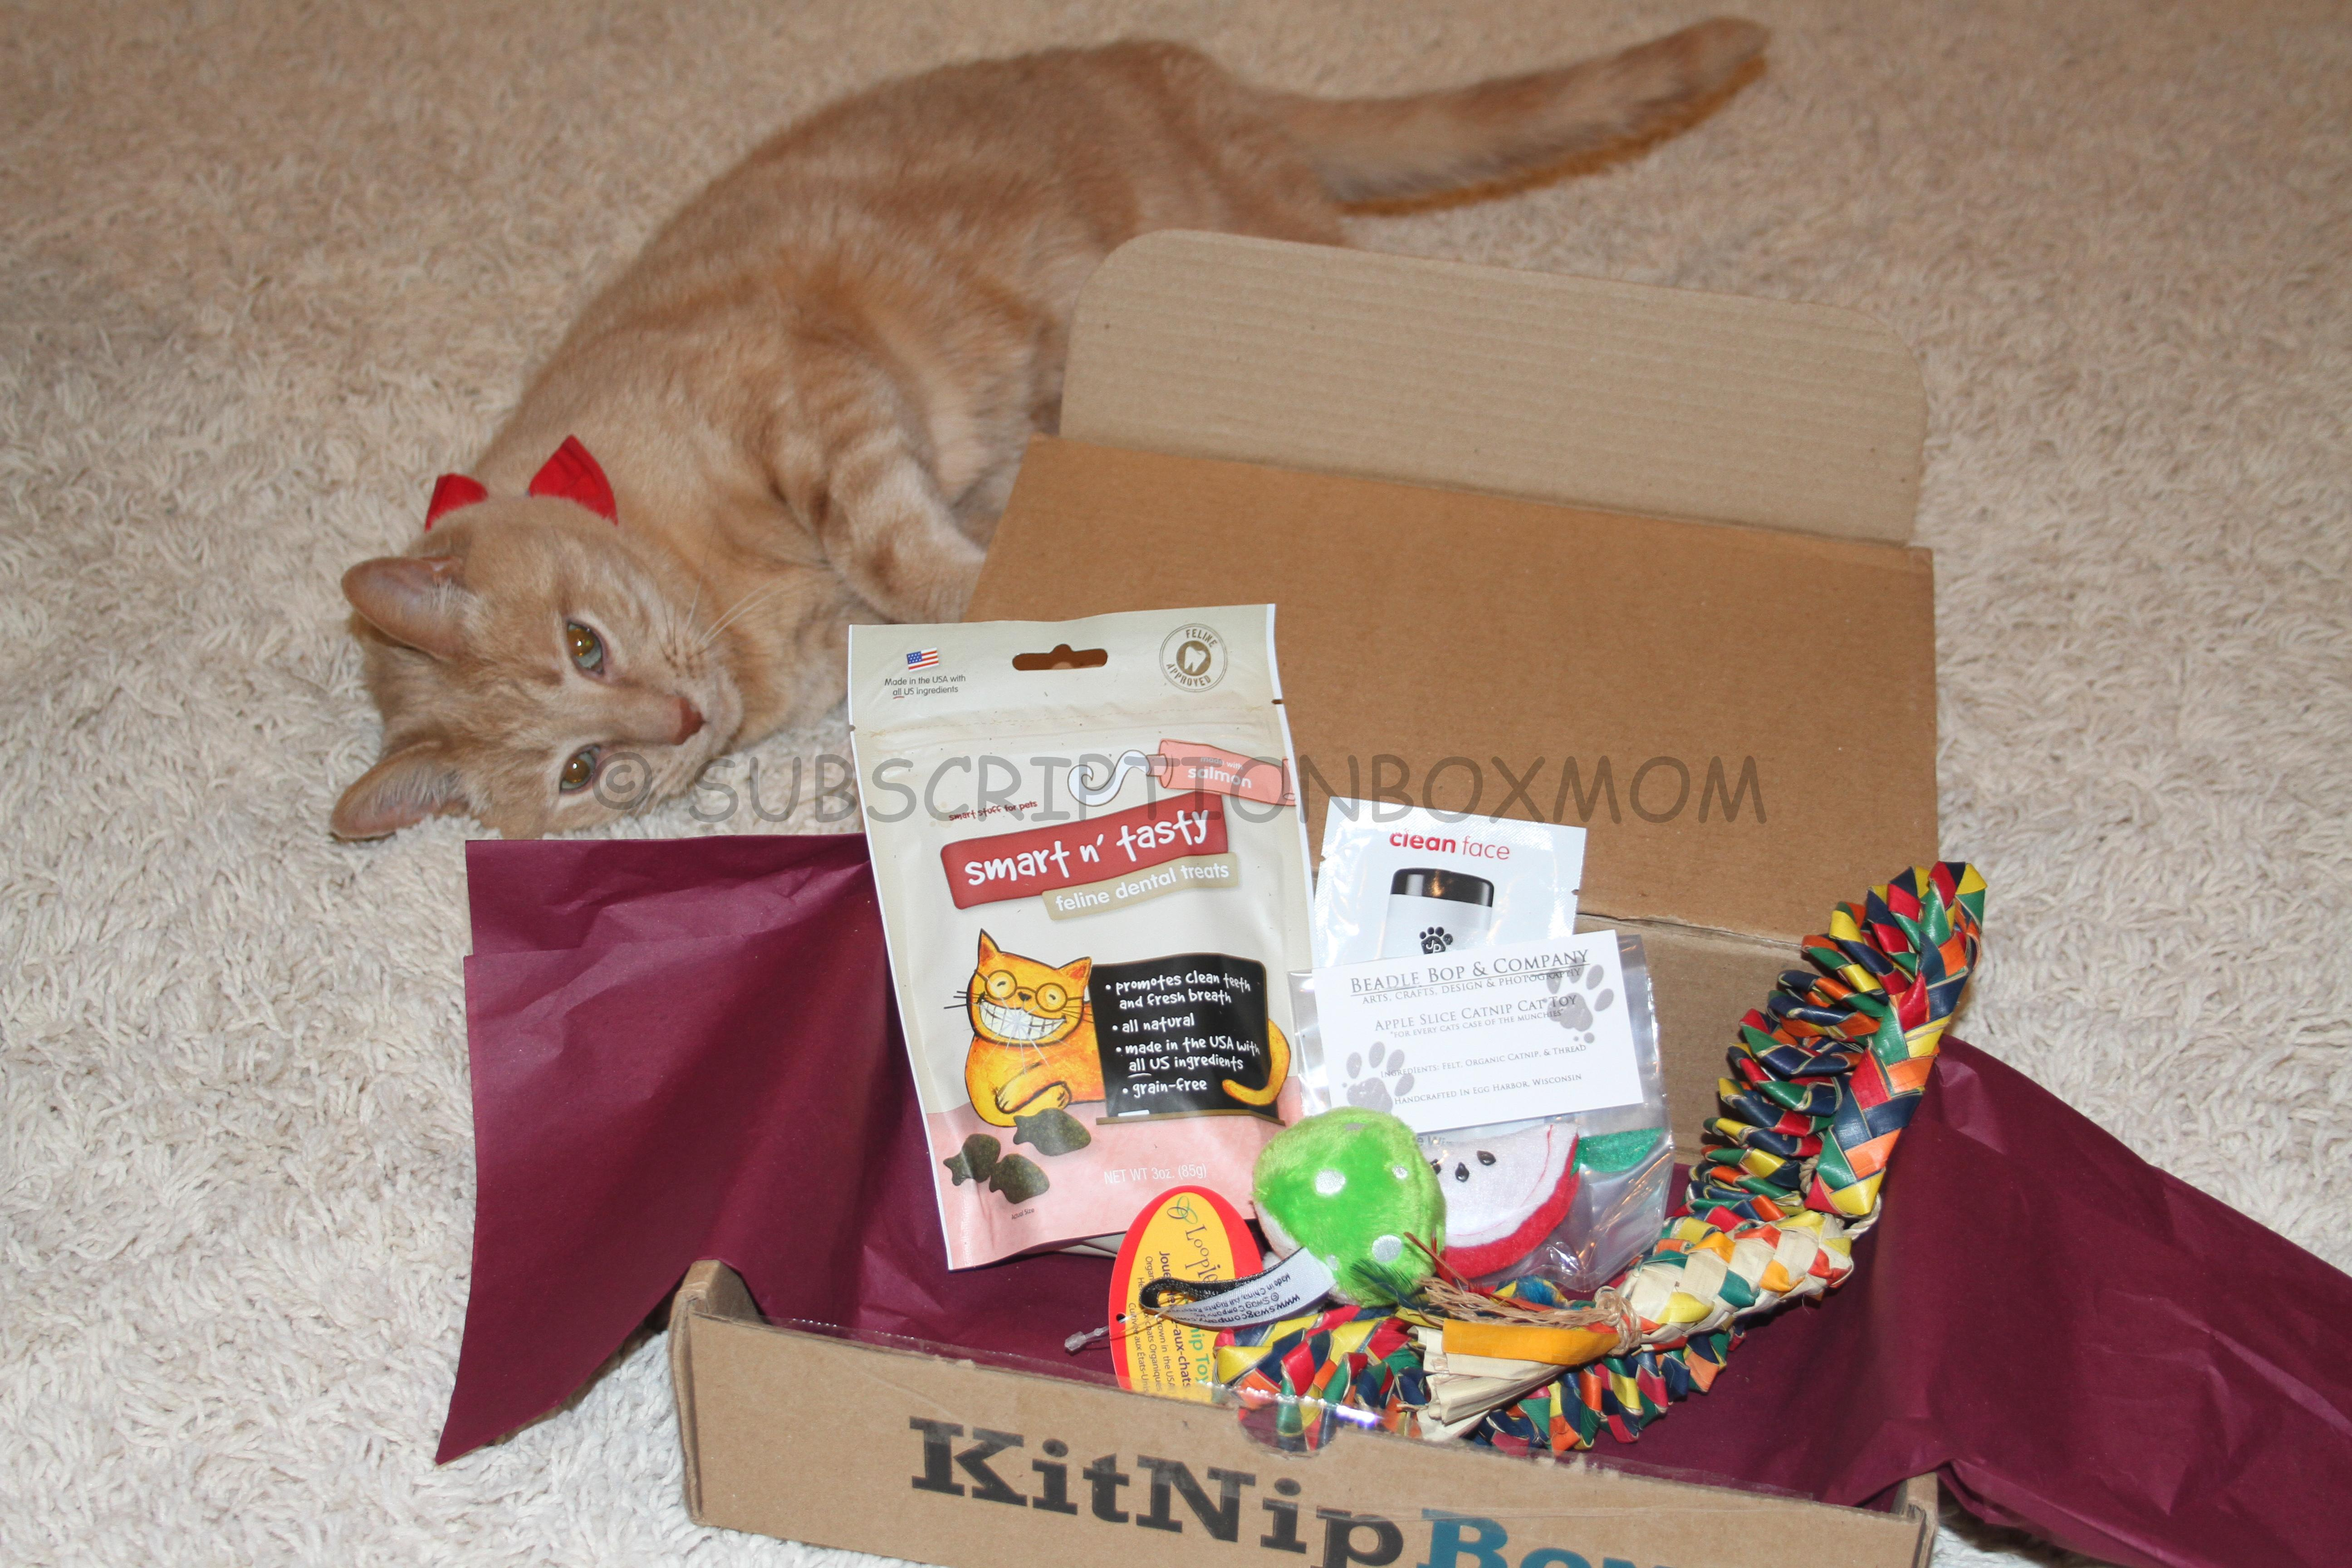 Kitnipbox November 2014 Review Save 15 Cat